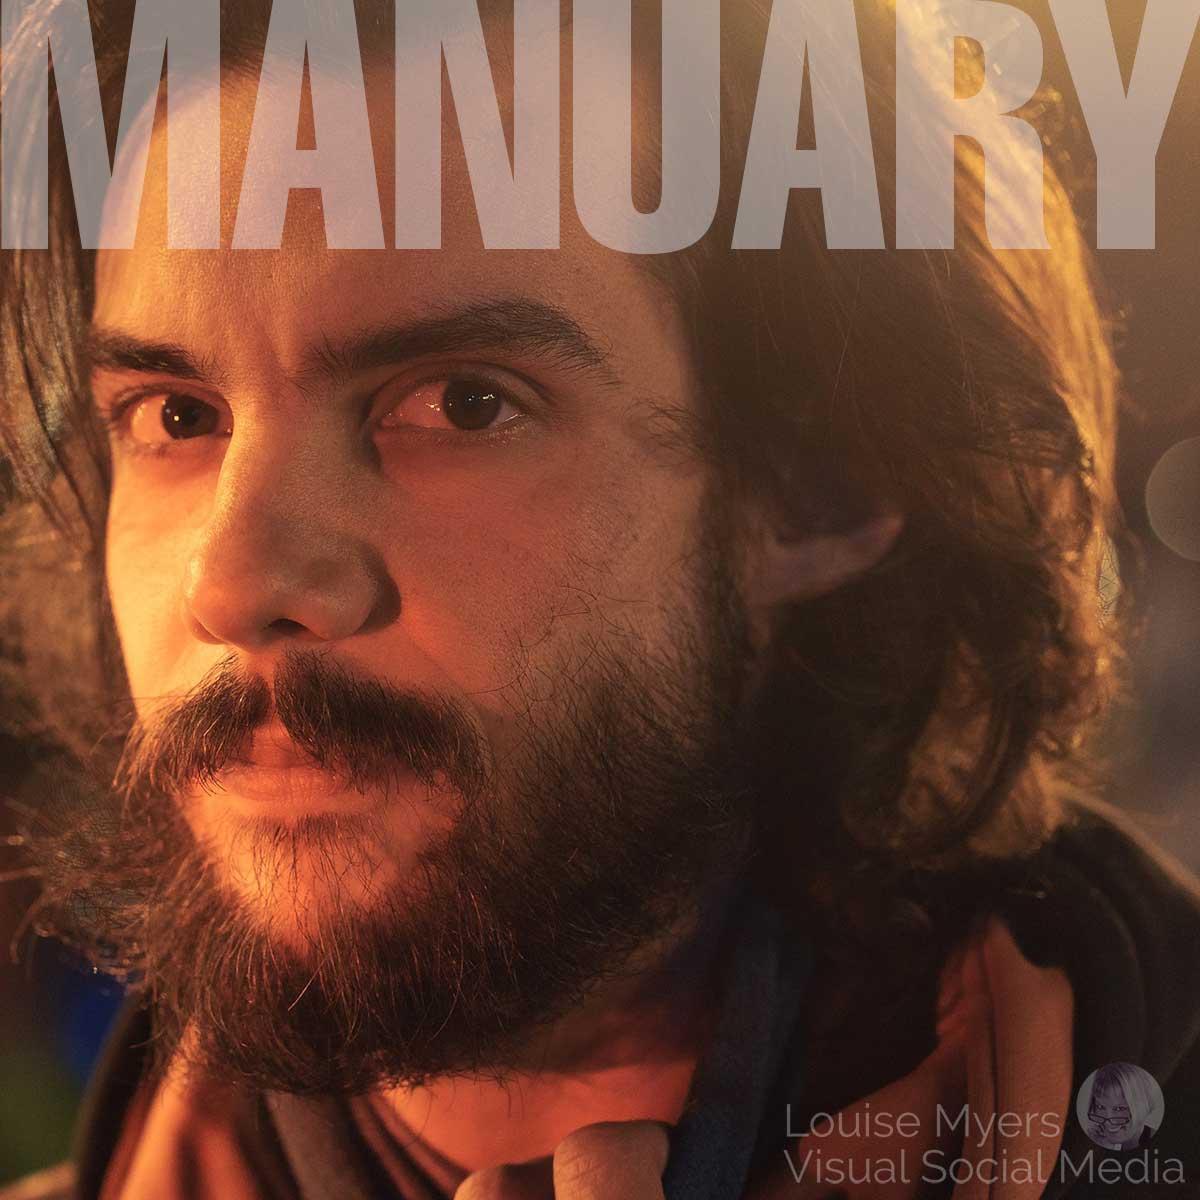 manuary text on photo of bearded man.